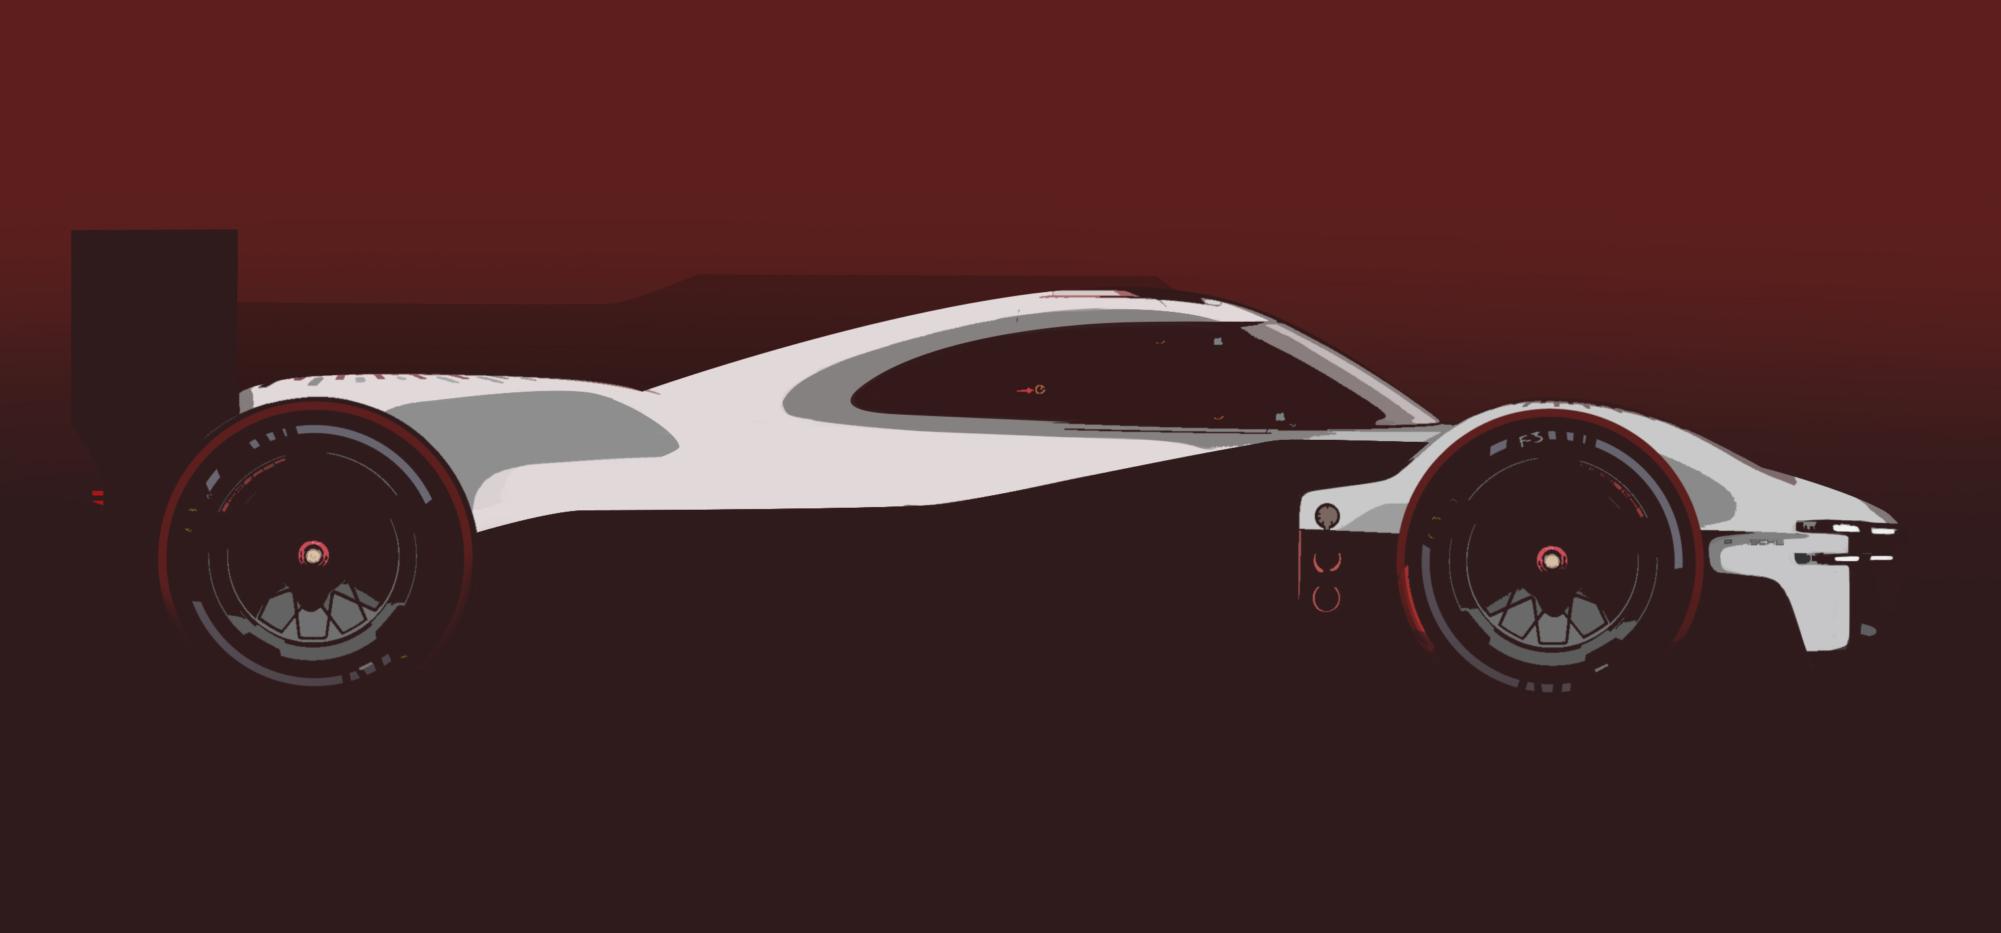 Porsche Returns to Le Mans a